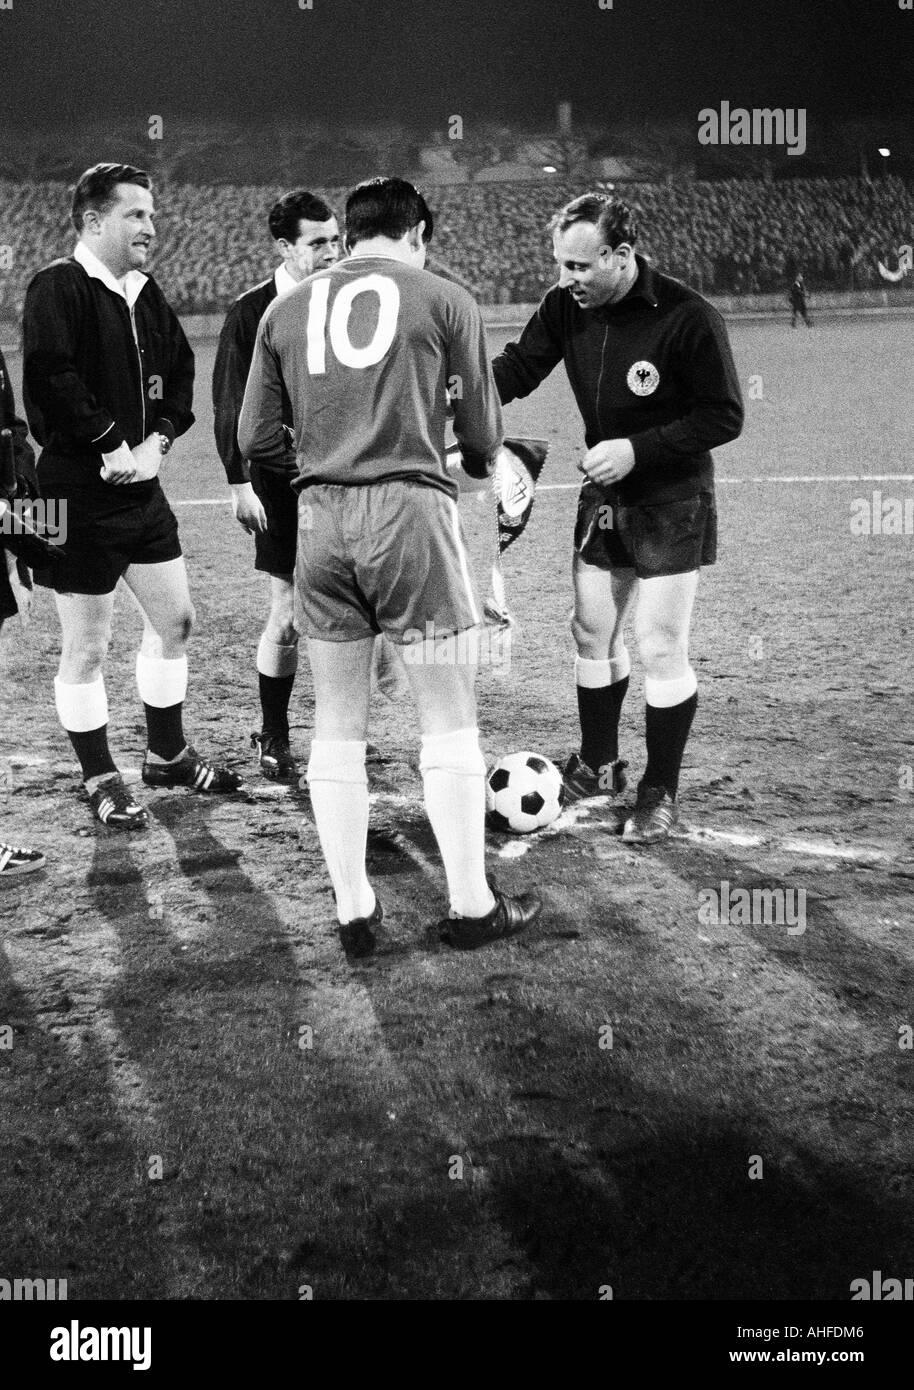 football, international match, 1965, Wedau Stadium in Duisburg, Germany versus FC Chelsea London 0:1, referee Gerhard Schulenburg from Hamburg and assistants, team leader ___ (Chelsea, No. 10) and Uwe Seeler (Germany, right) - Stock Image